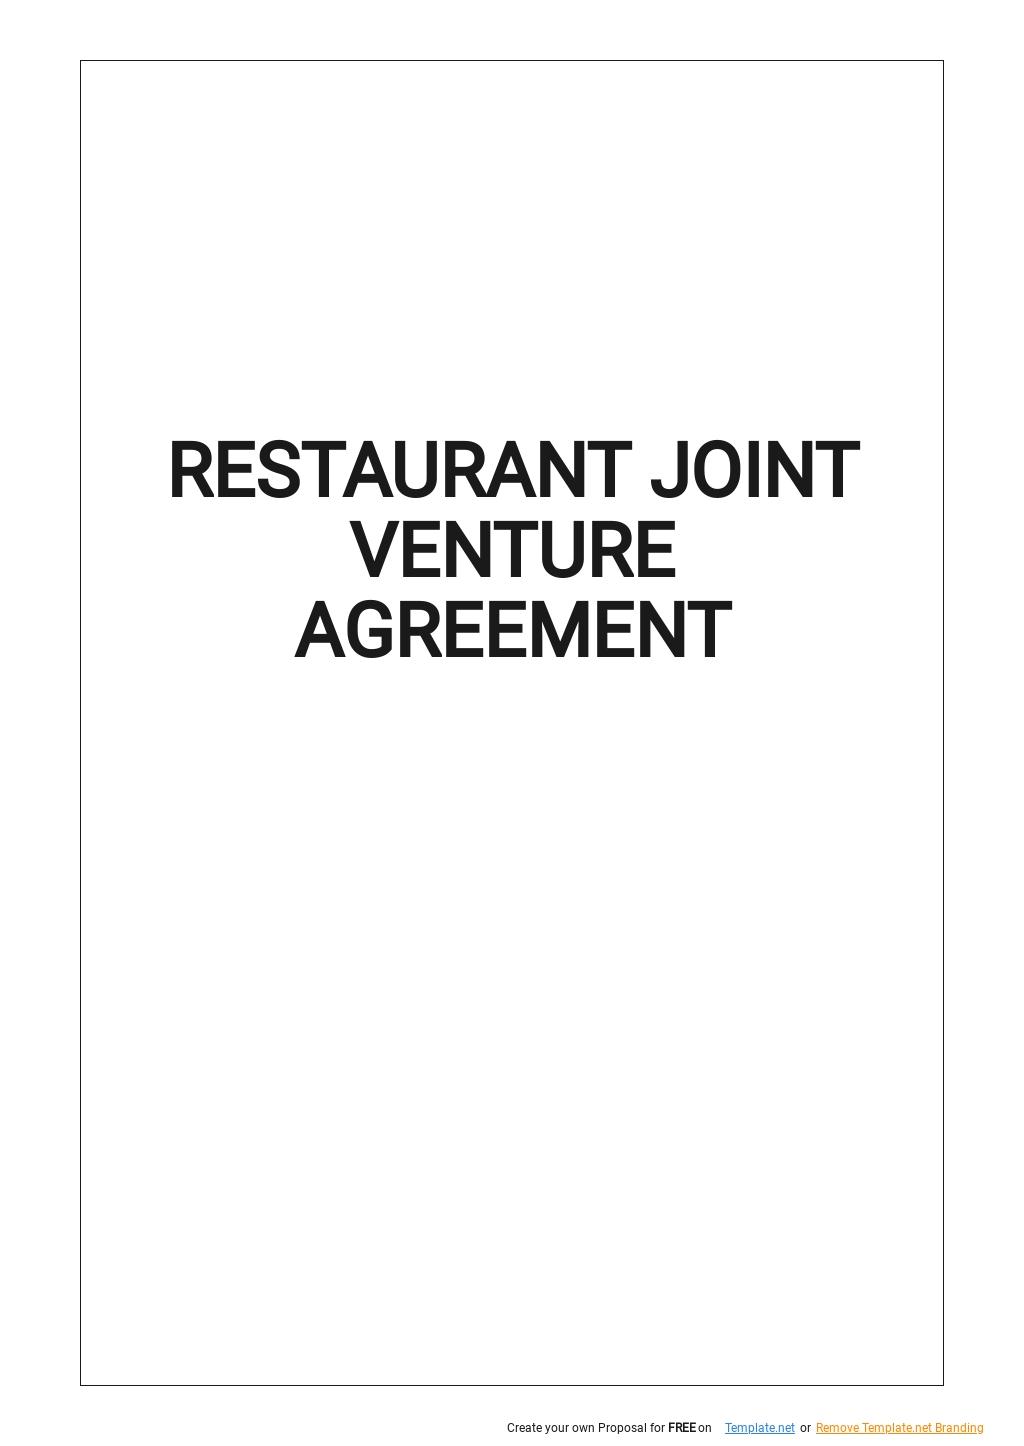 Restaurant Joint Venture Agreement Template.jpe